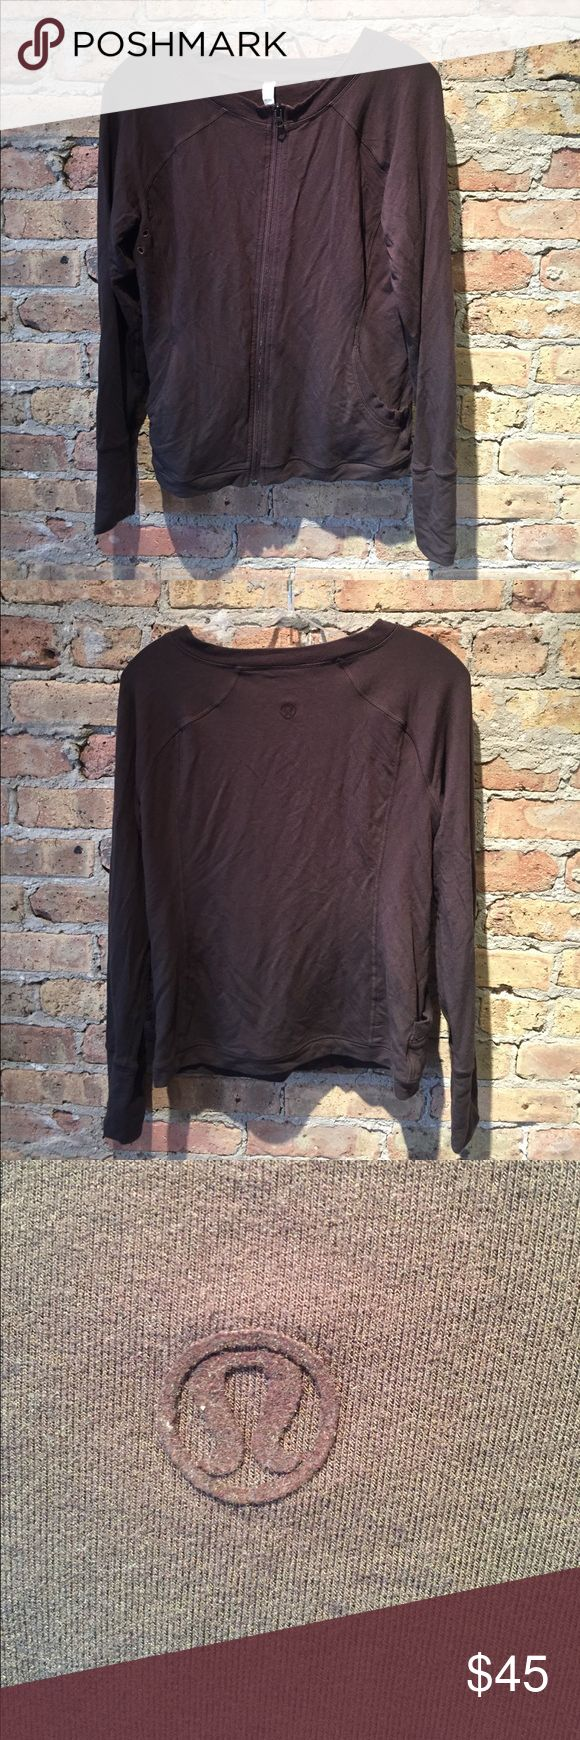 Lululemon brown zip up sweatshirt, sz 8, 55651 Lululemon brown zip up sweatshirt, sz 8, excellent used condition lululemon athletica Tops